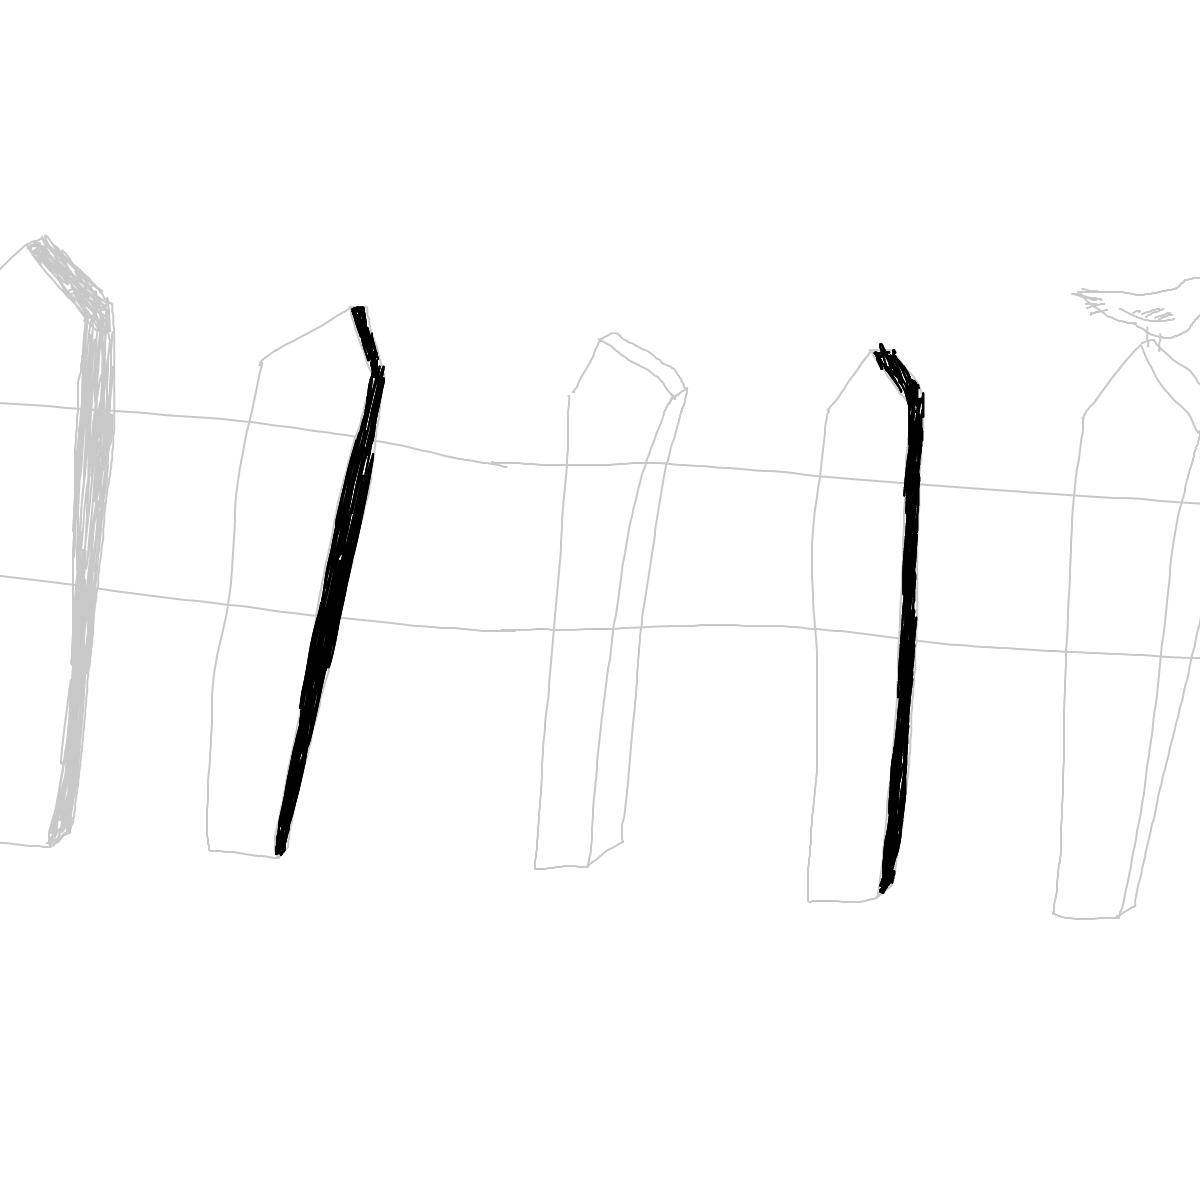 BAAAM drawing#9384 lat:52.4750442504882800lng: 13.4073247909545900